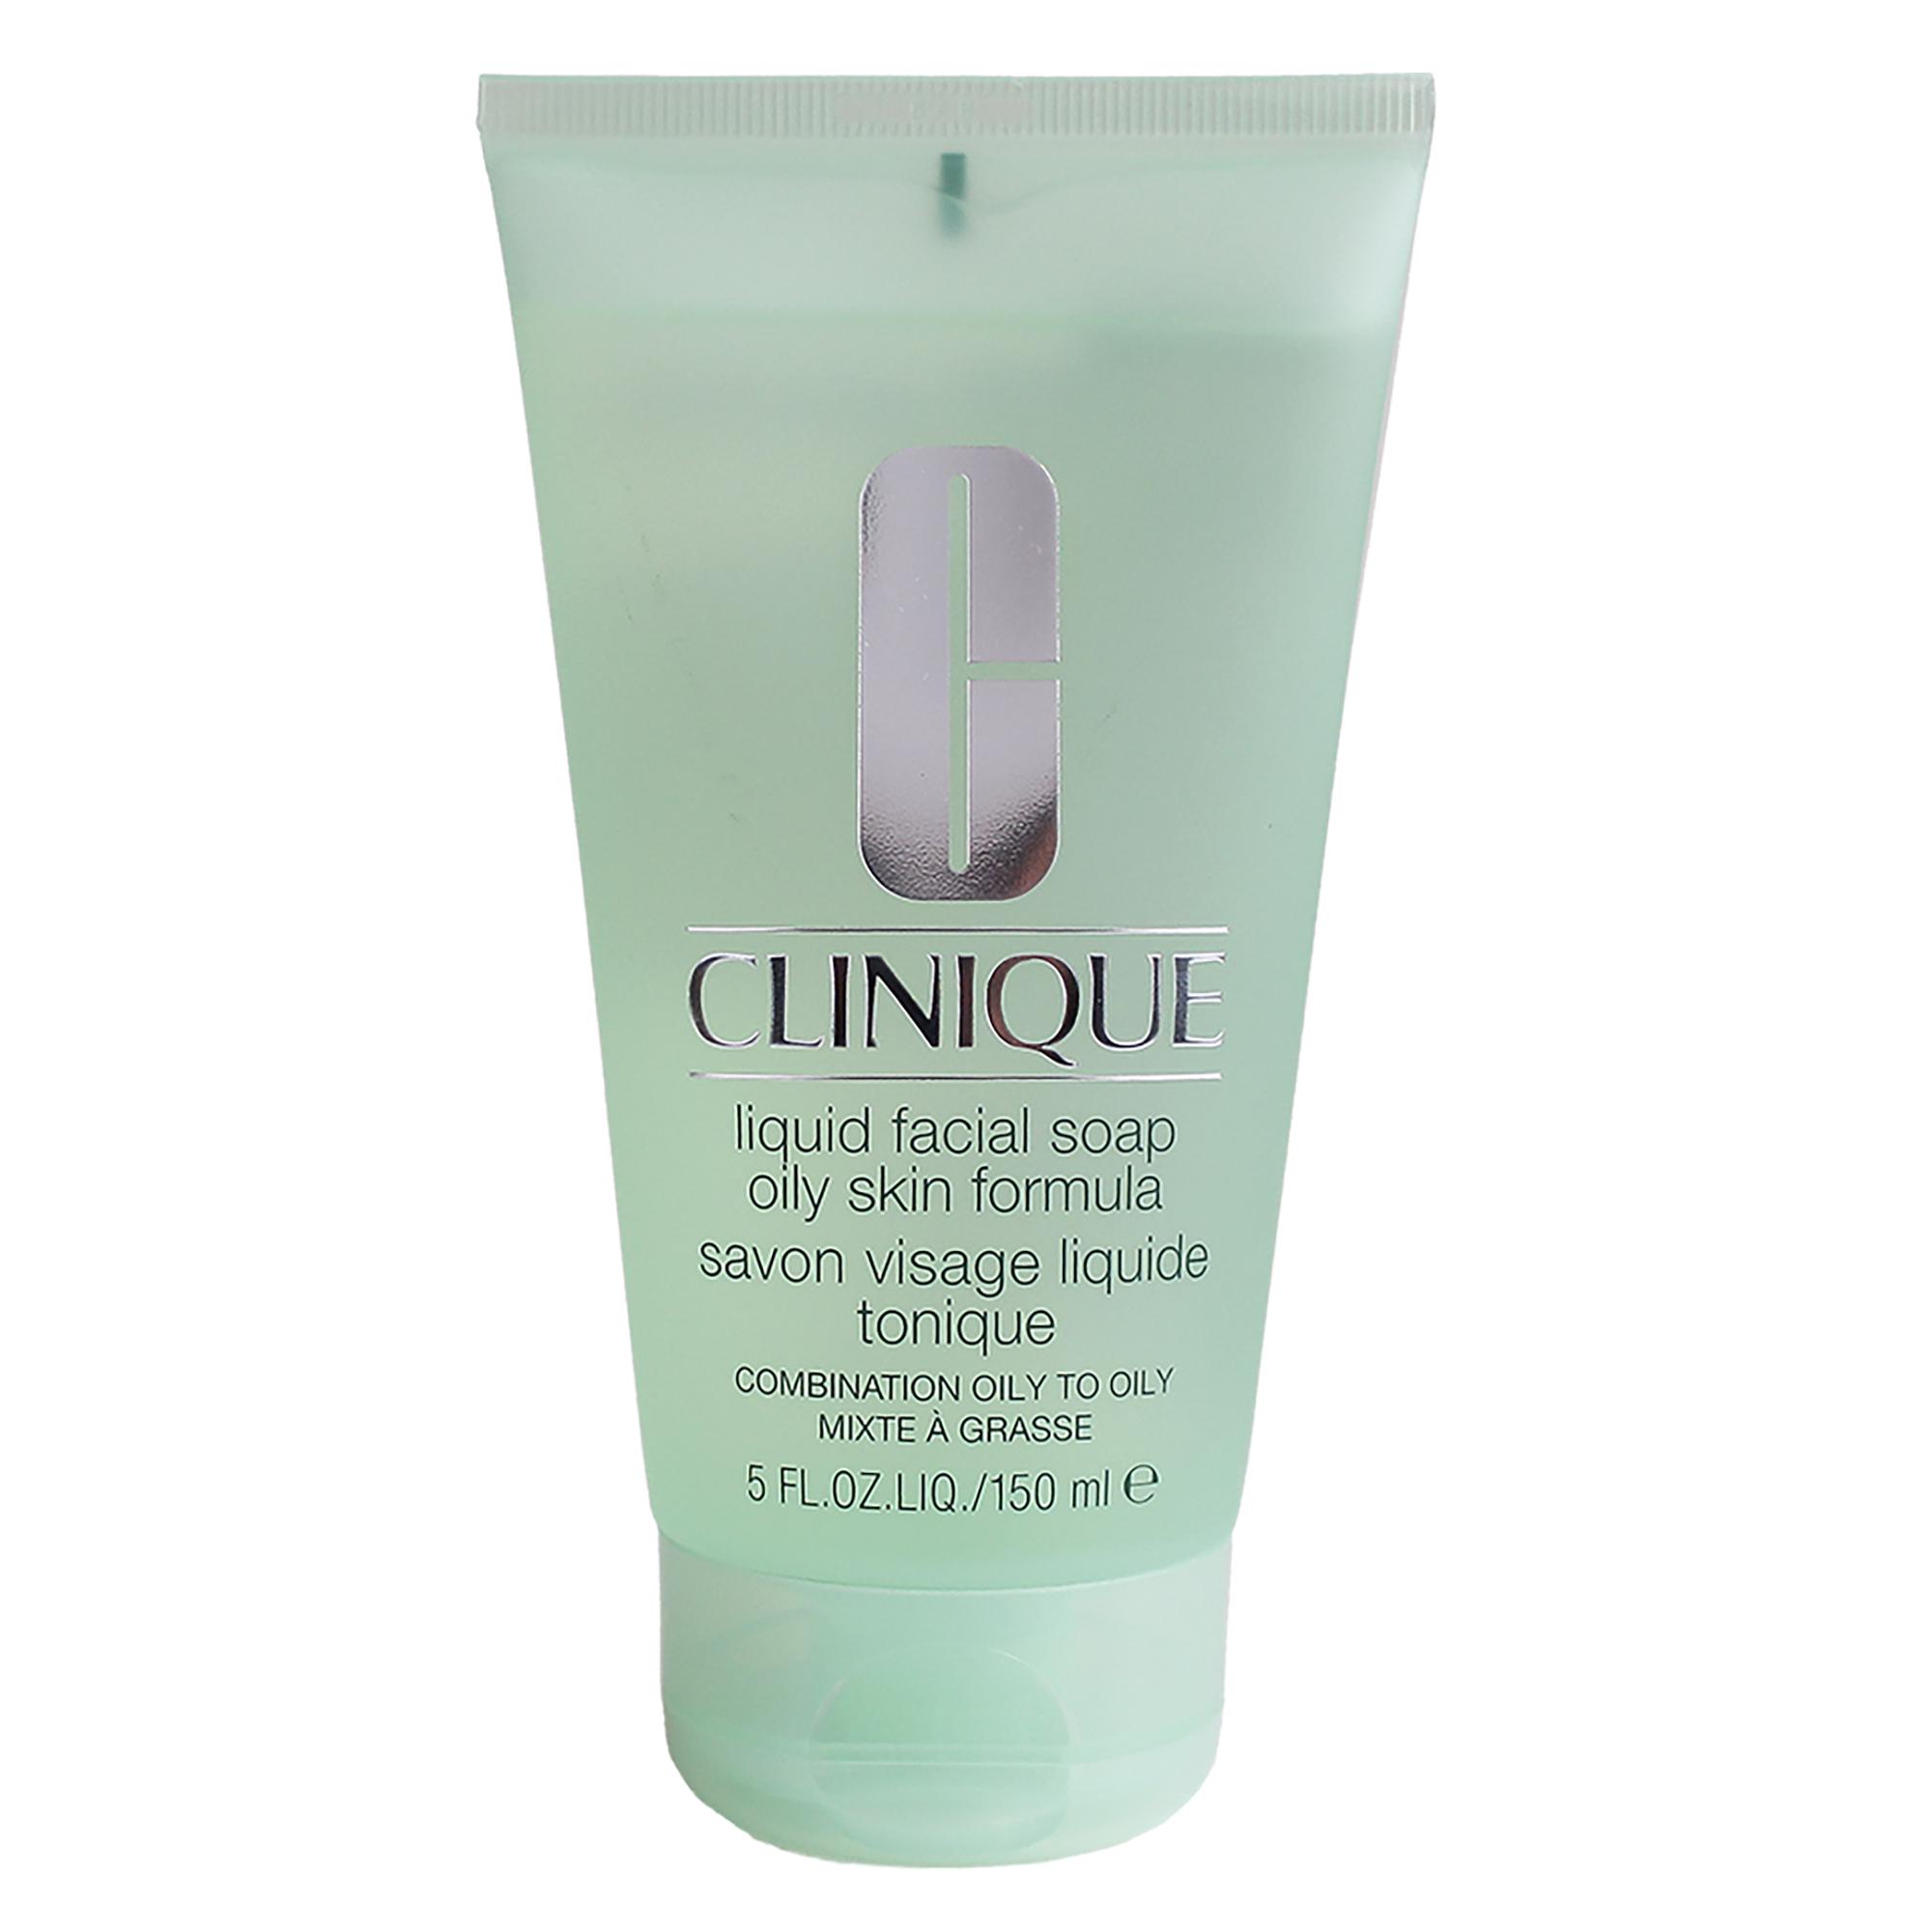 Liquid Facial Soap - Oily Skin Formula by Clinique #13